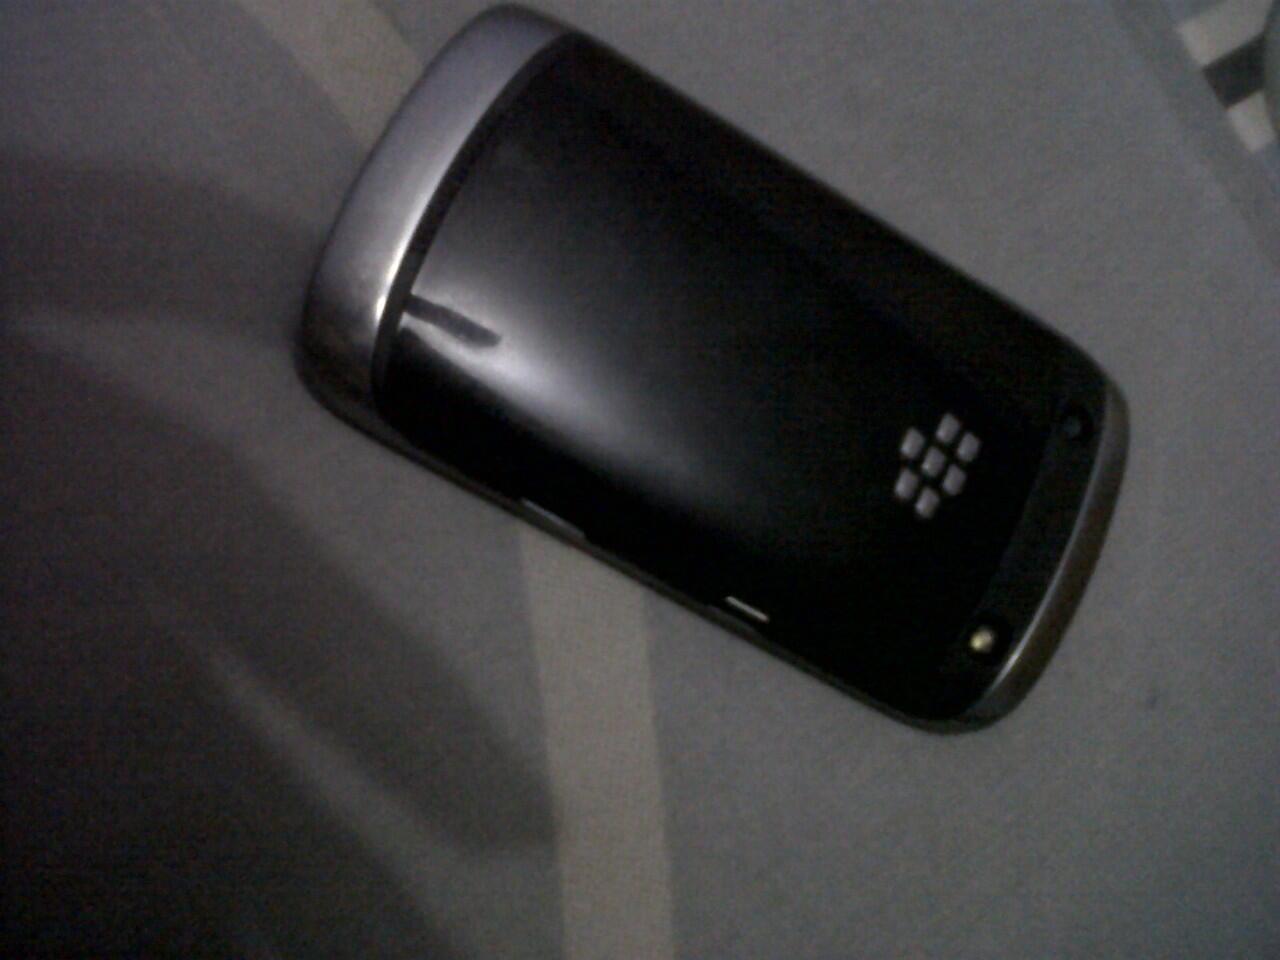 BLACKBERRY 9360 APPOLO | BATANGAN | MURAH | segel TAM | MULUS